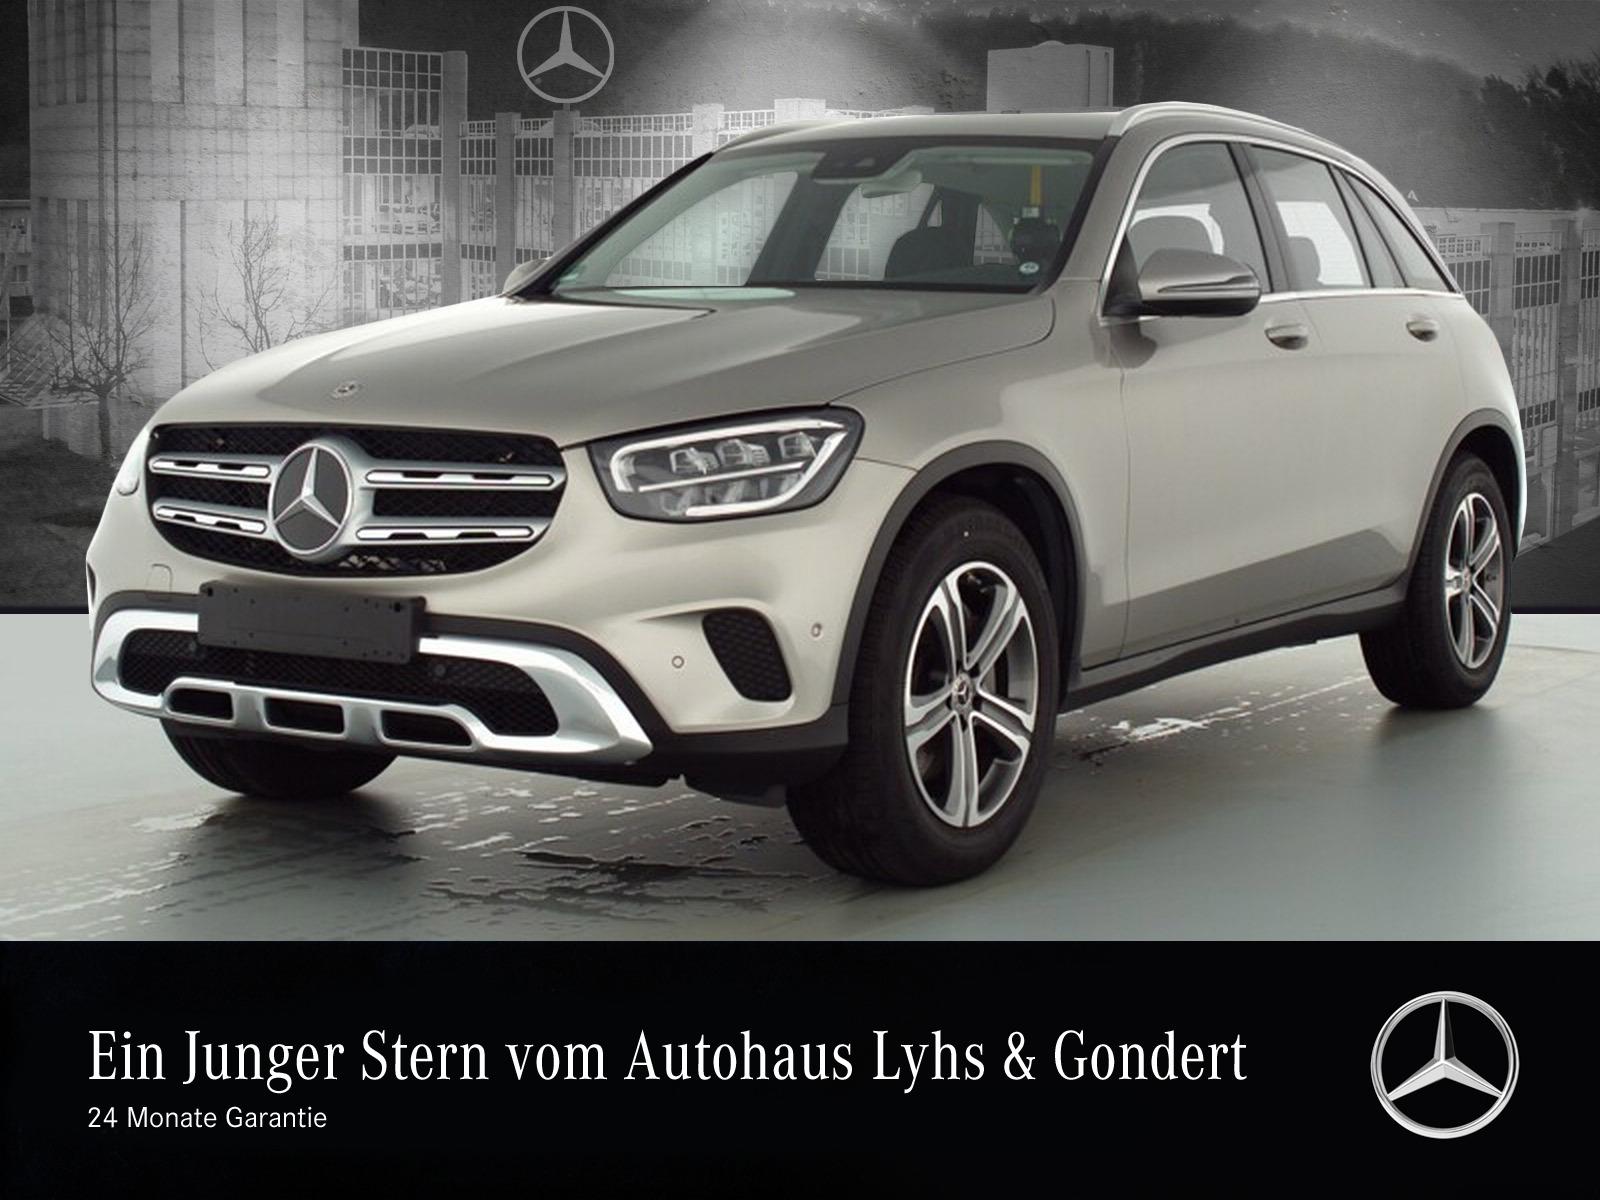 Mercedes-Benz GLC 200 4MATIC Exclusive*Assist-Pak.*LED*Navi*, Jahr 2019, Benzin